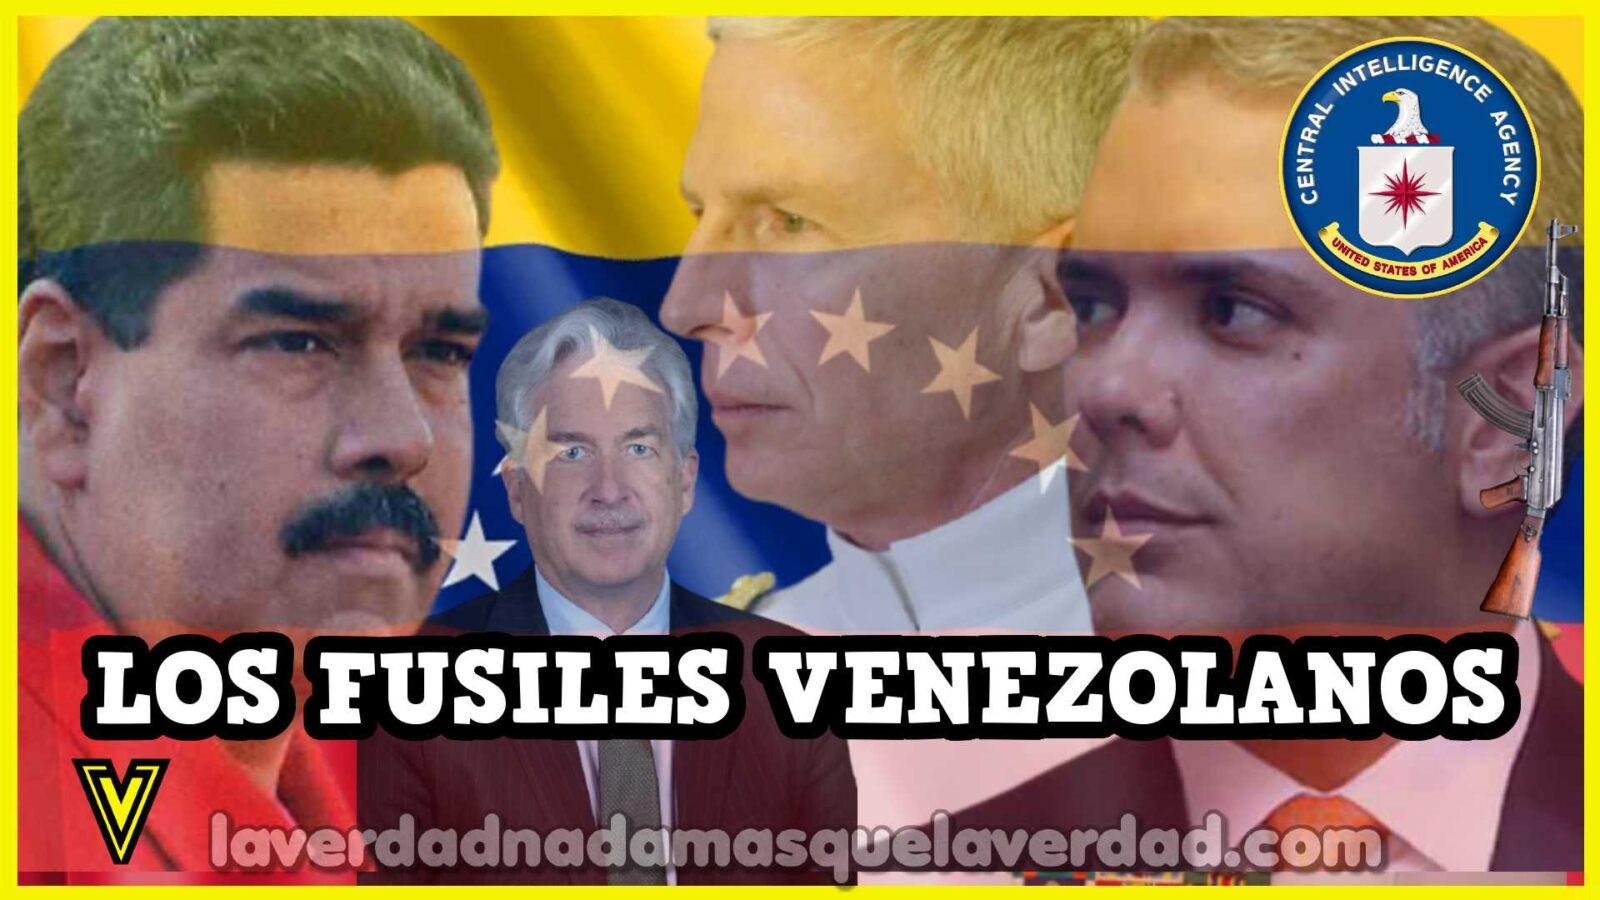 MADURO-DUQUE-FUSILES-VENEZOLANOS-ATENTADO